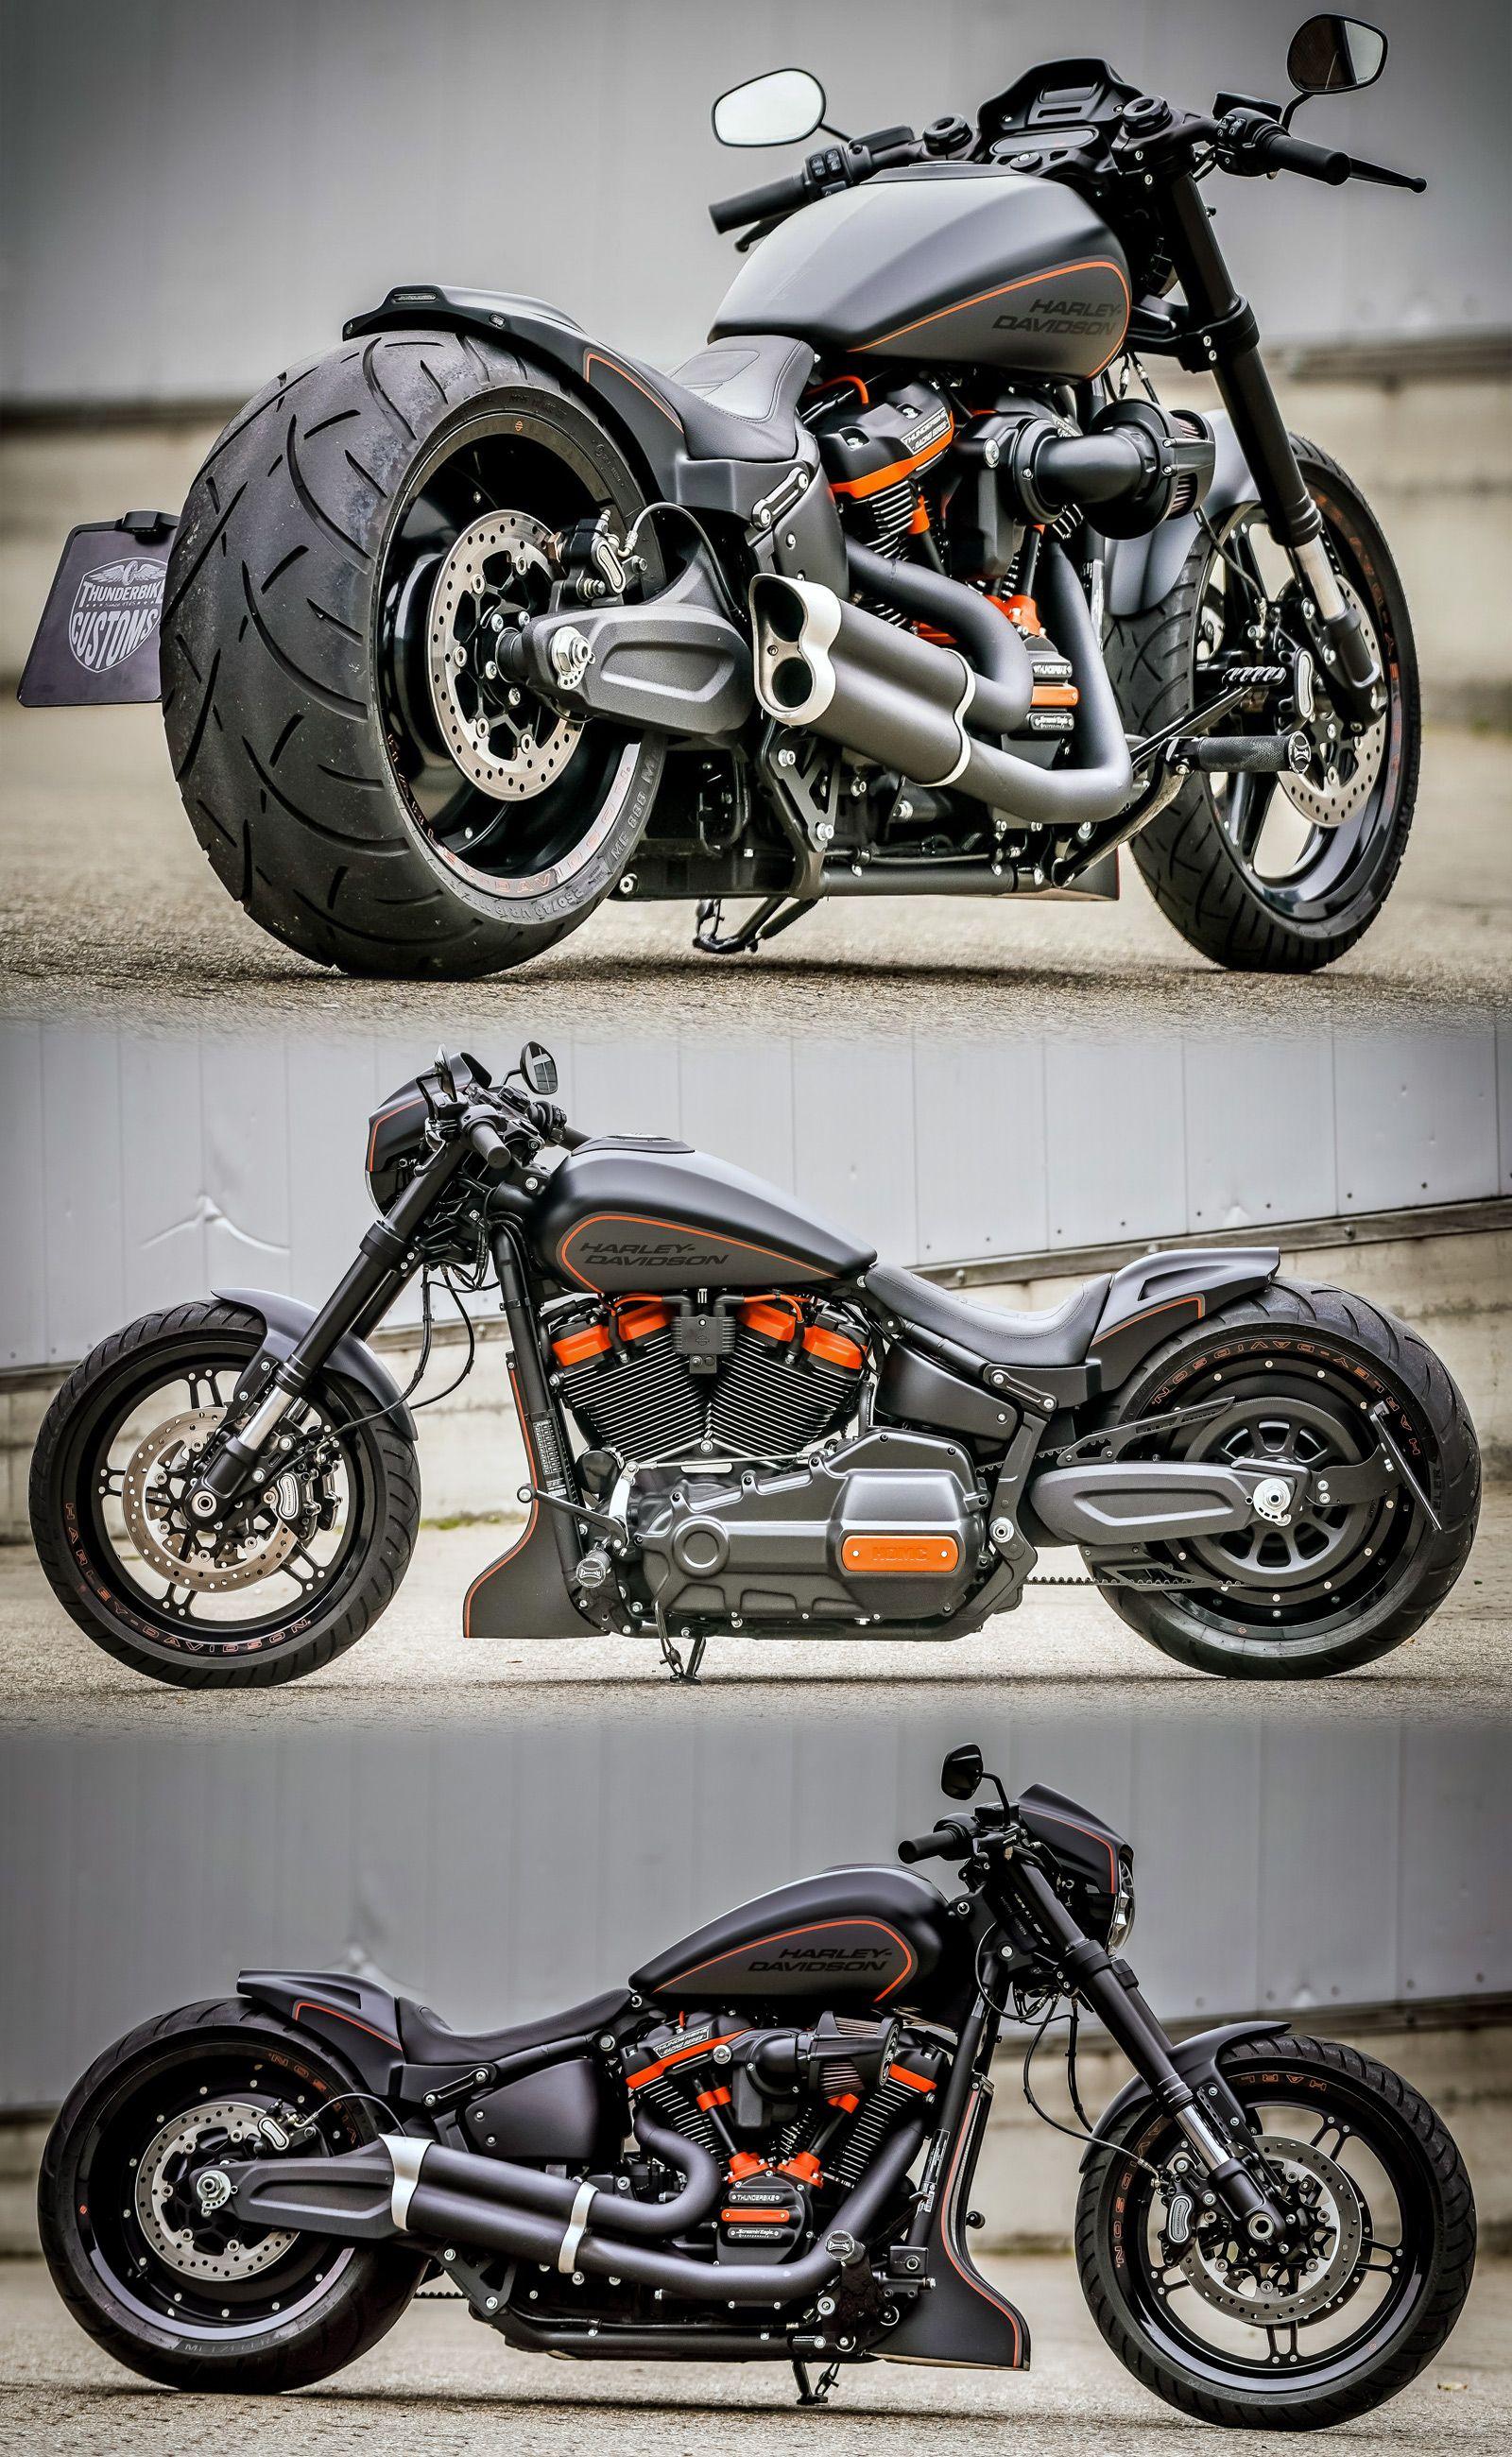 Thunderbike Harley Davidson Fxdr Custom Motorcycle Dragster Style Custom Motorcycles Harley Bobber Motorcycle Harley Bikes